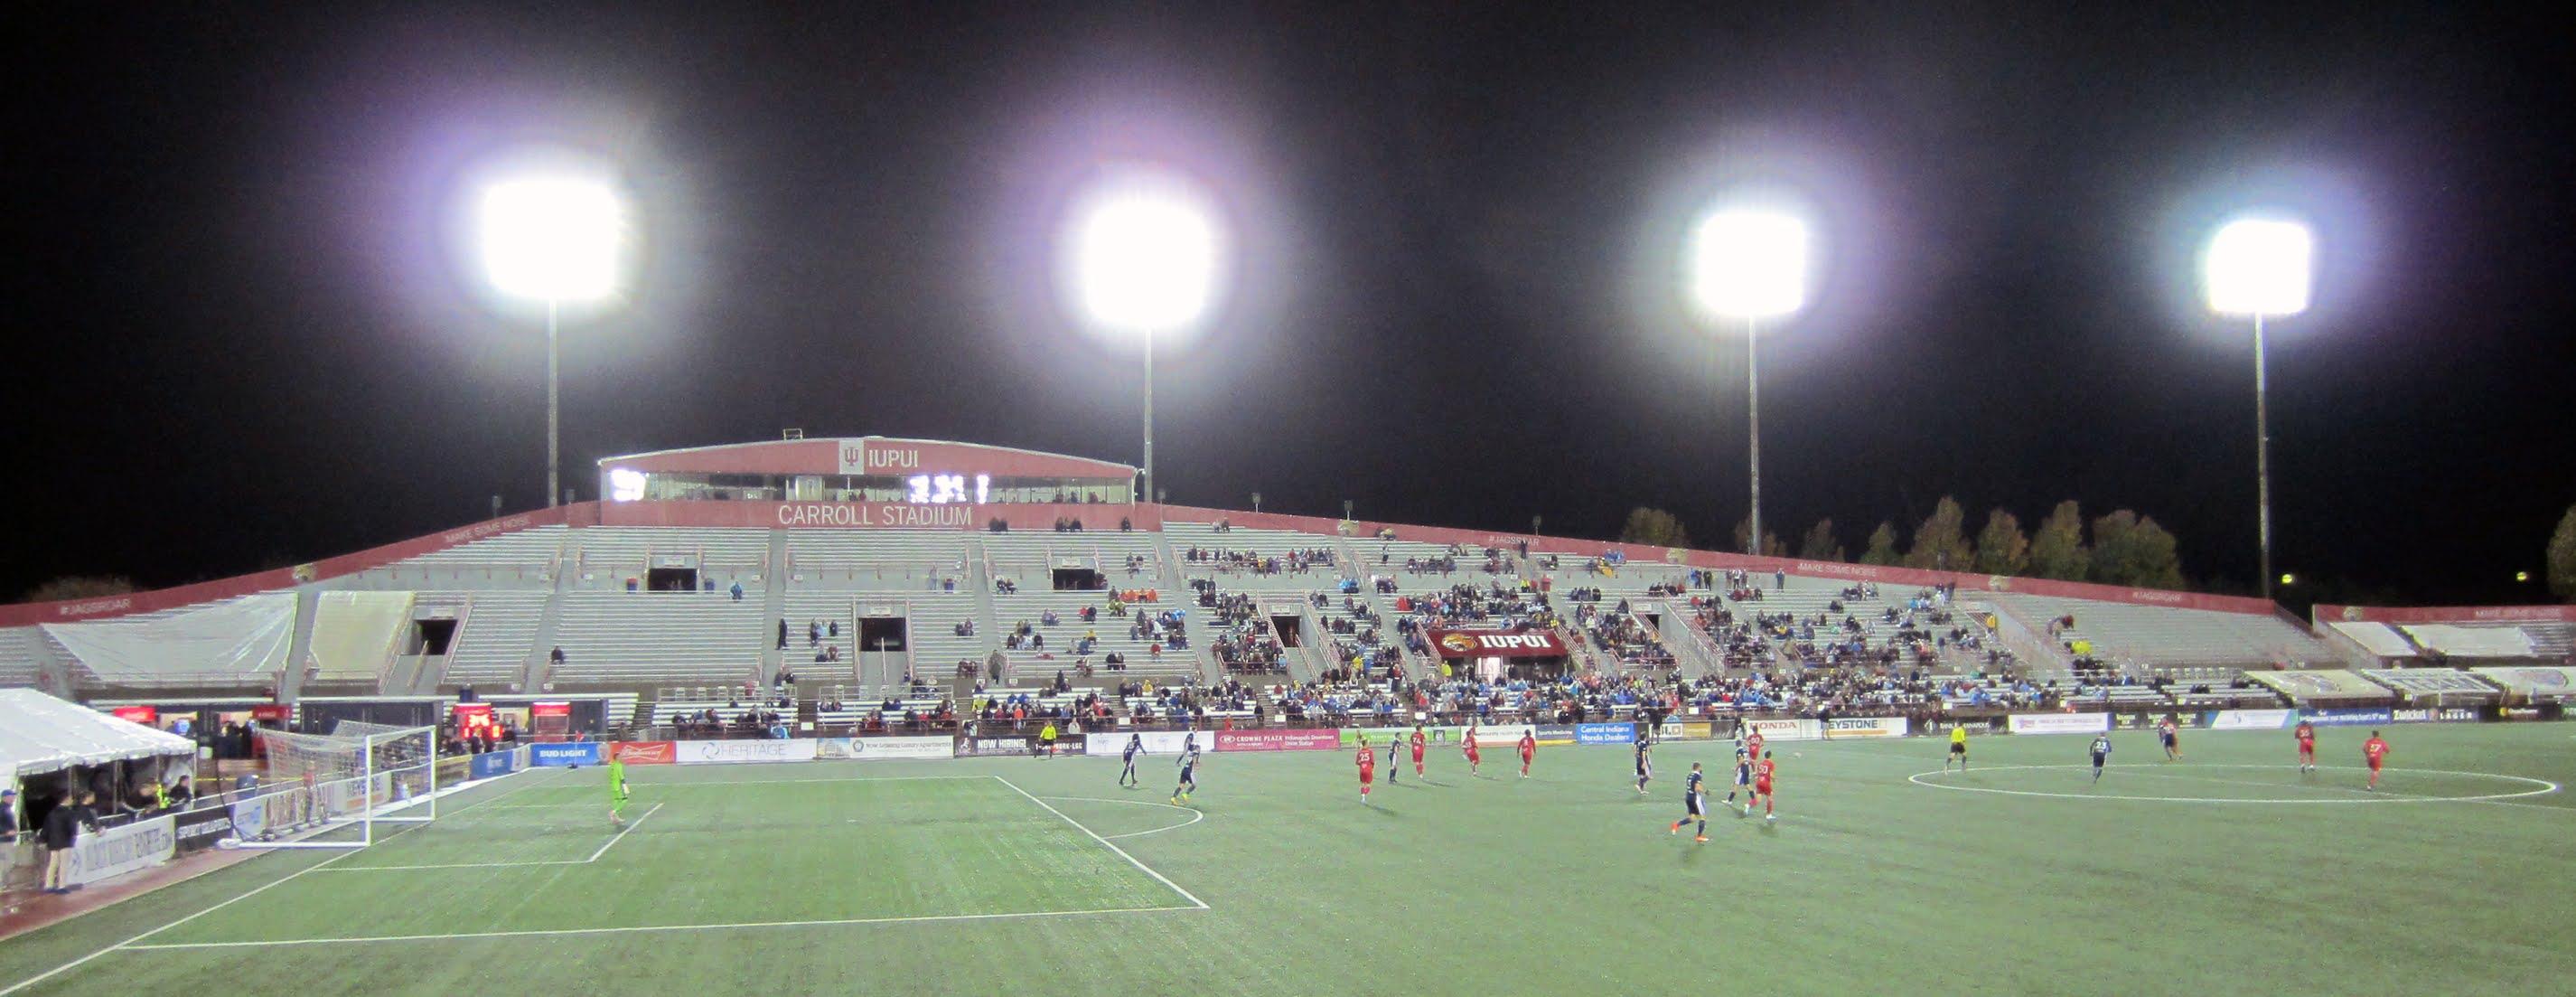 The main stand at Carroll Stadium, IUPUI